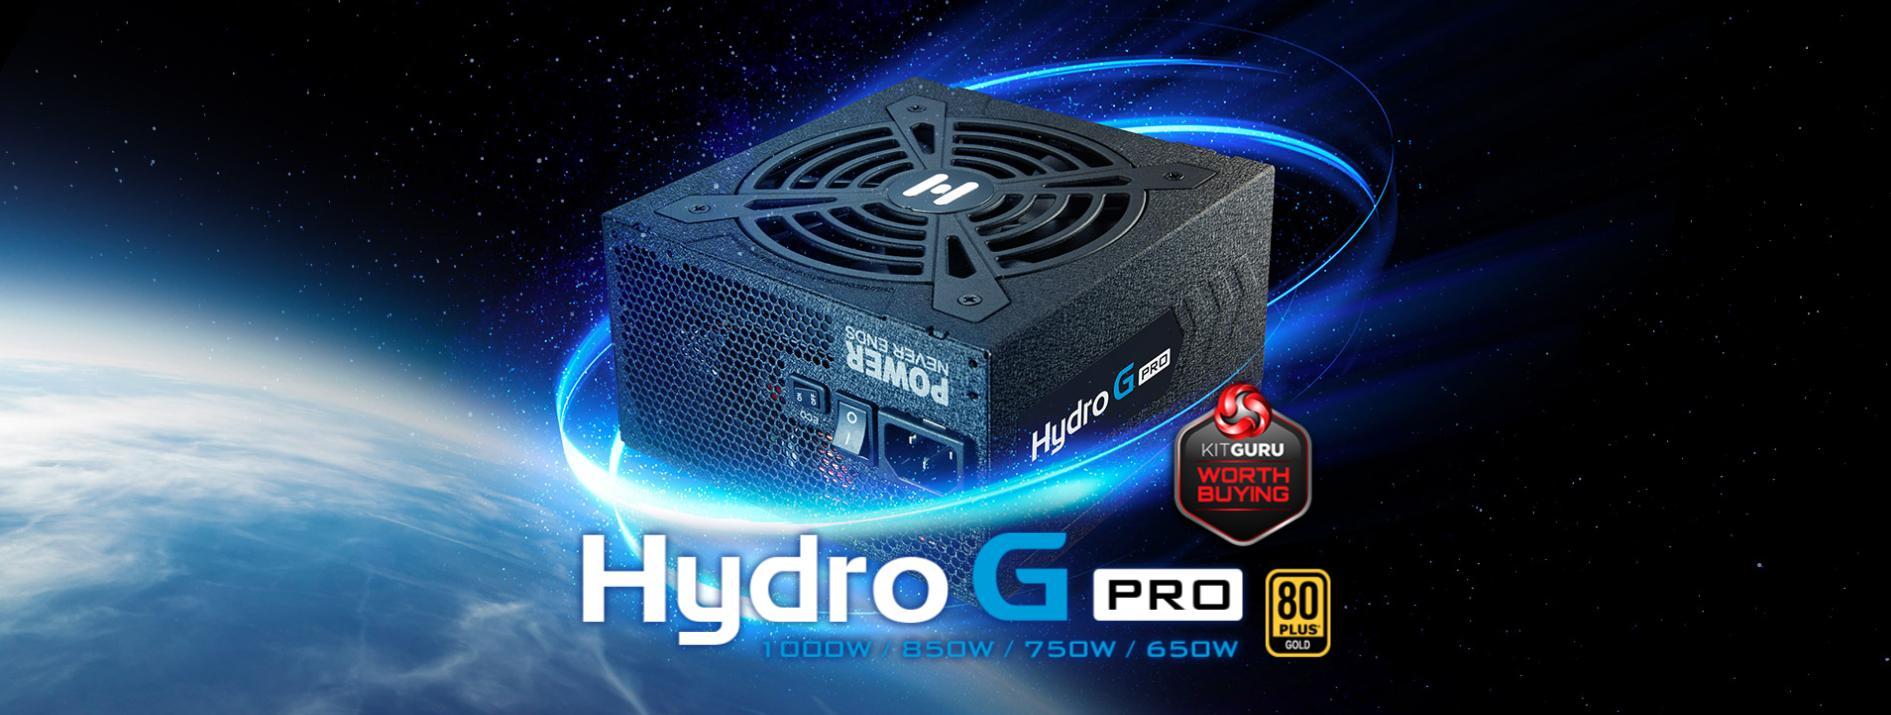 FSP Power Supply HYDRO G PRO Series Model HG2-1000 - Active PFC - 80 Plus Gold - Full Modular giới thiệu